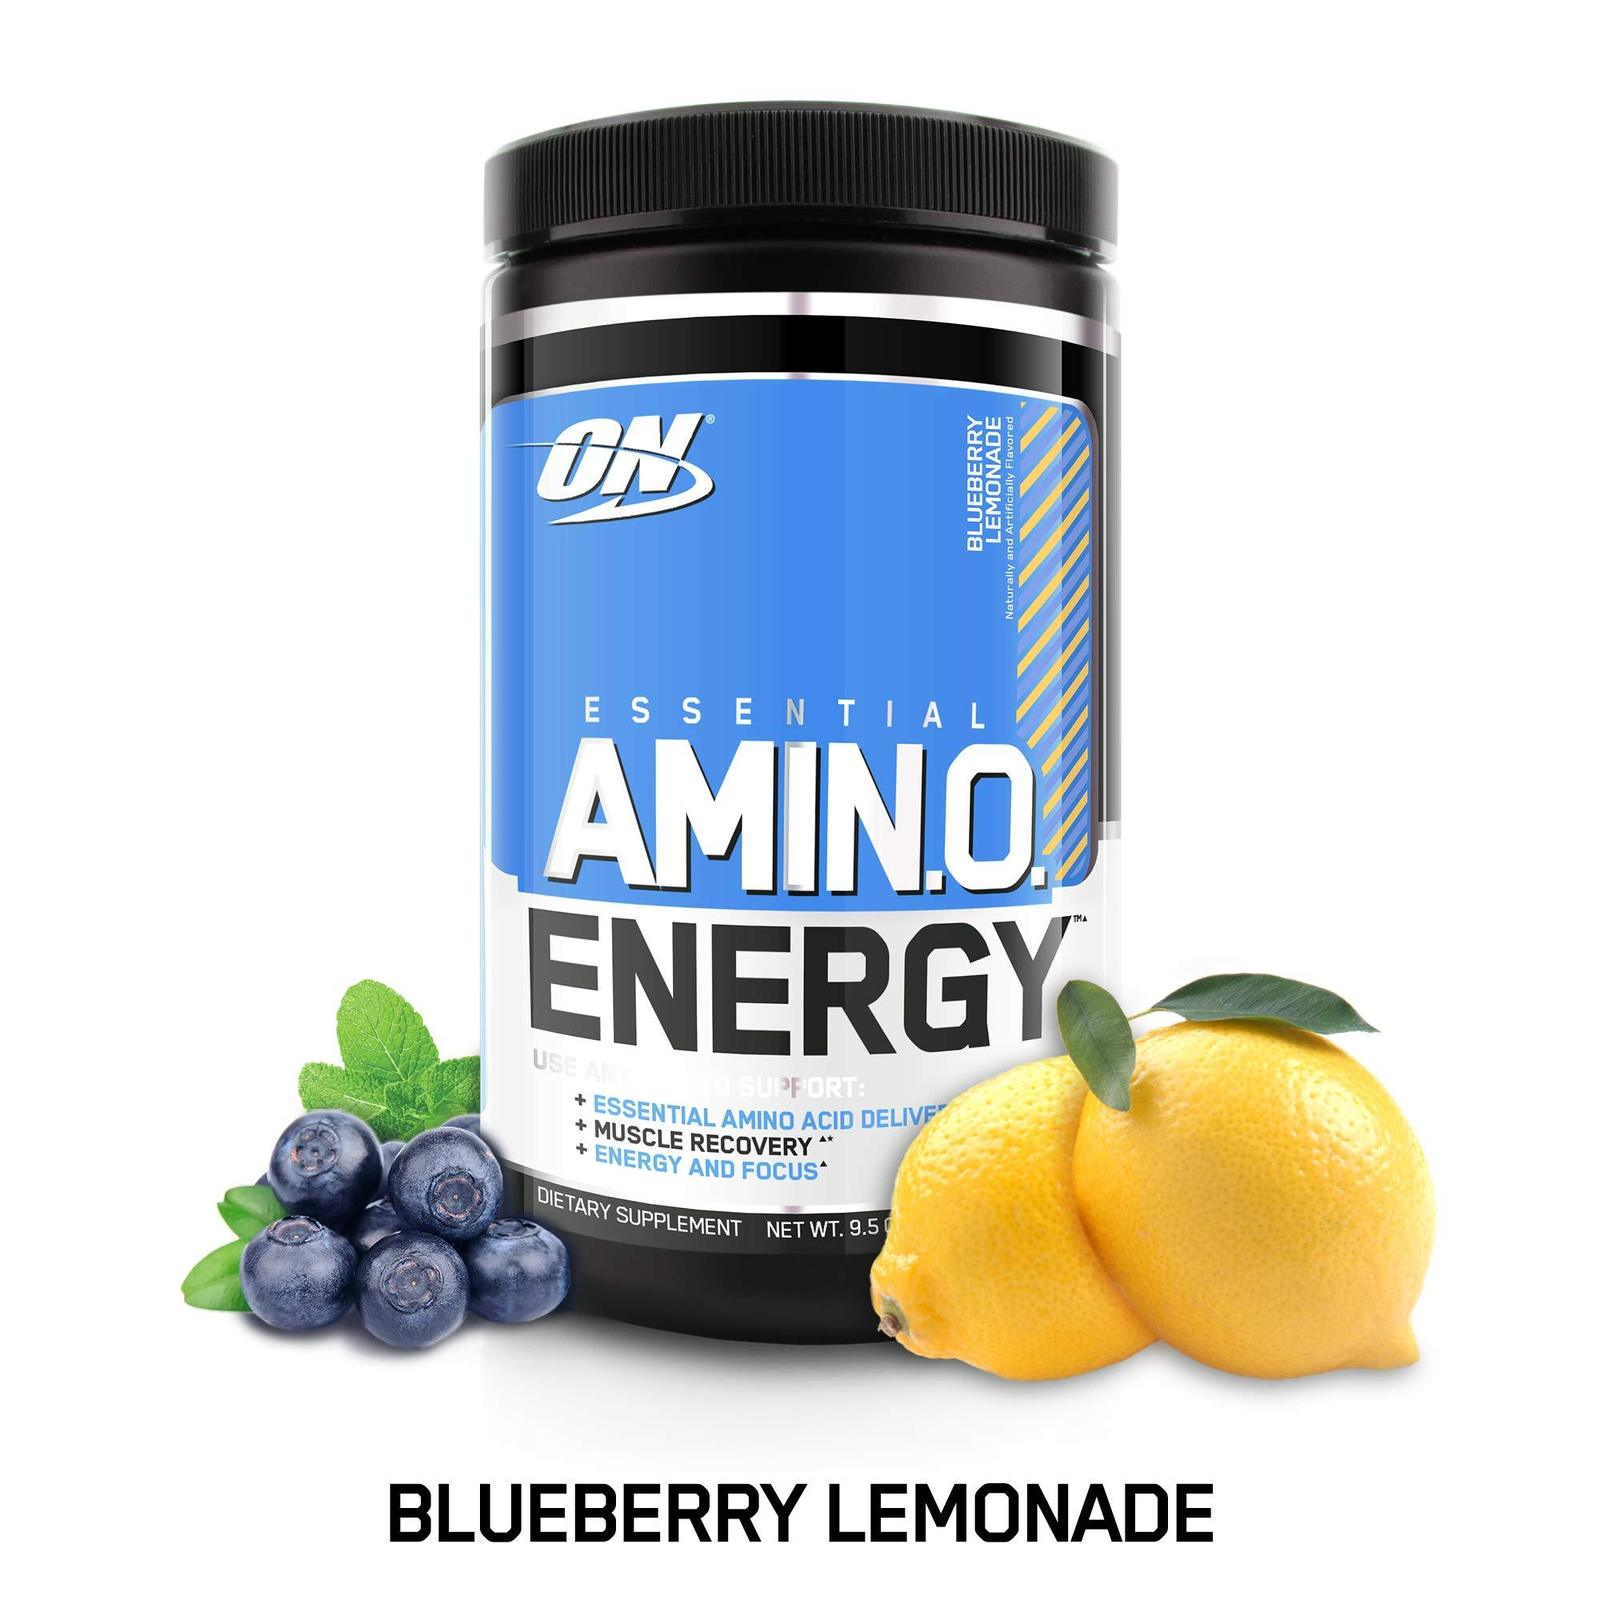 Optimum Nutrition Amino Energy with Green Tea and Green (Blueberry Lemonade) - $94.73